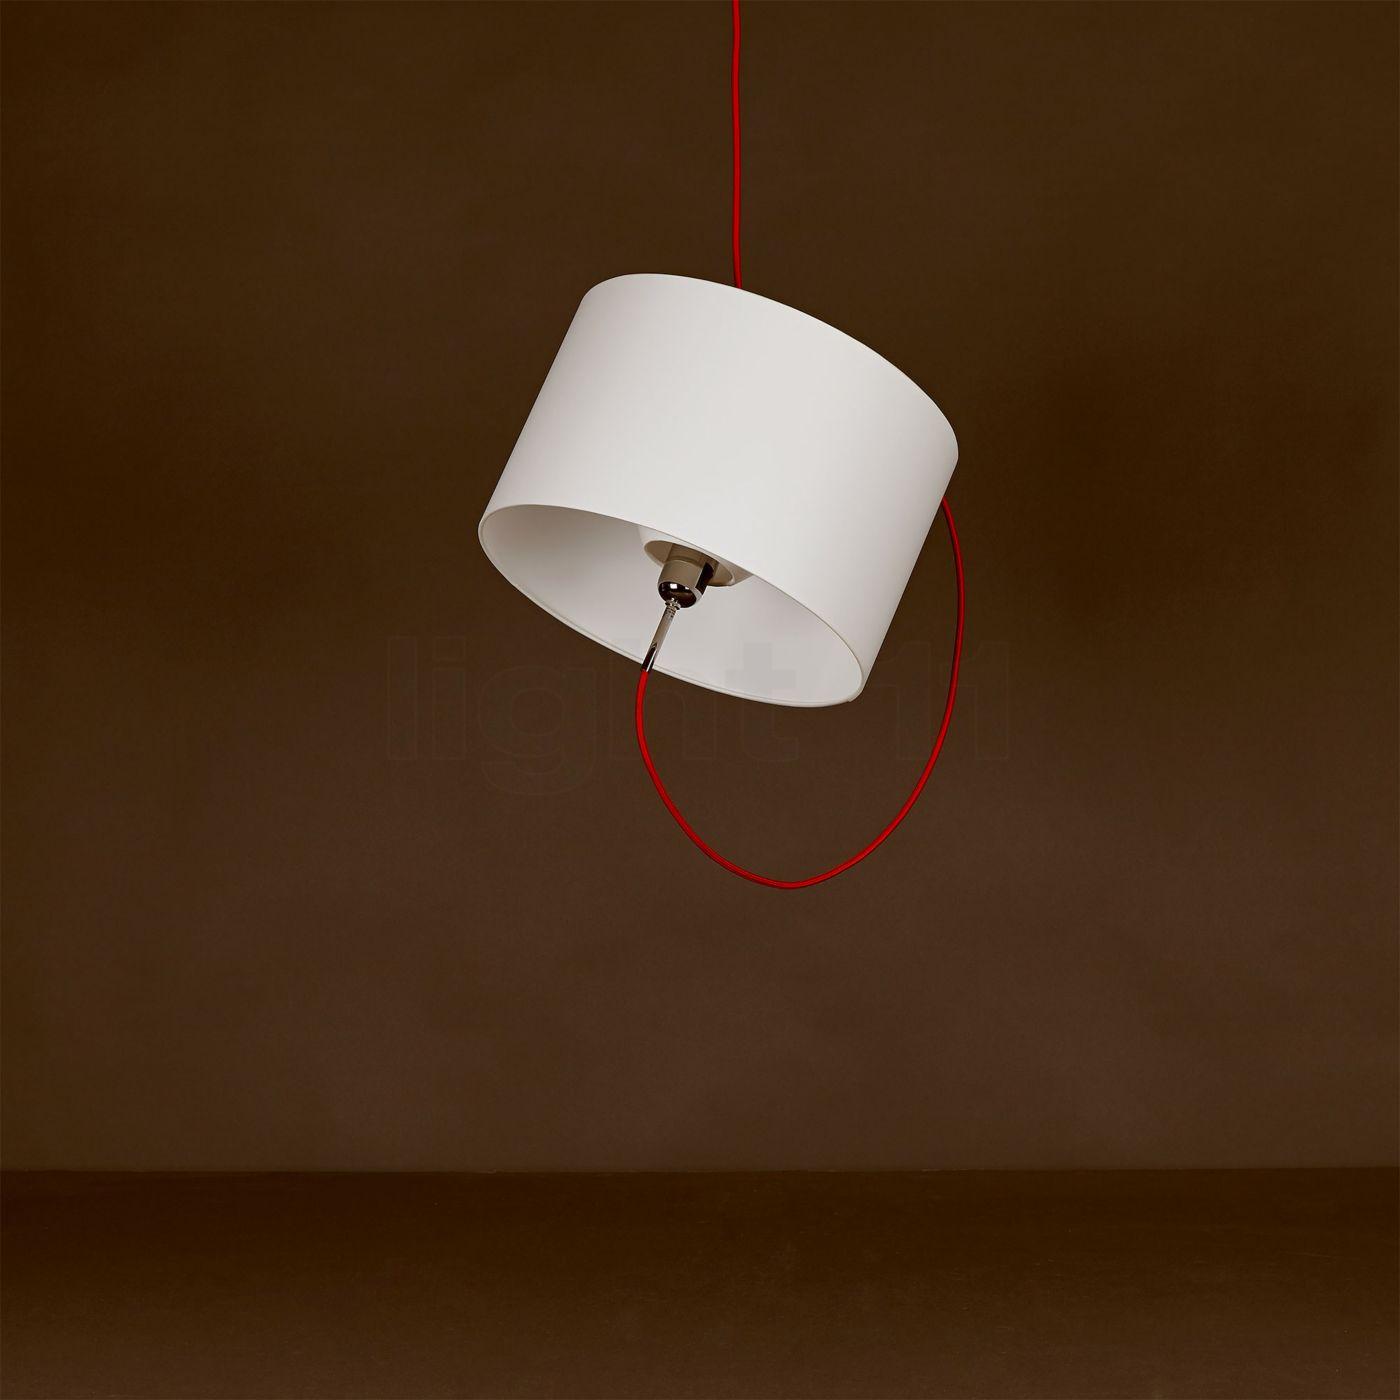 Steng Licht Re-Light Dezentrale Pendelleuchte kaufen bei light11.de